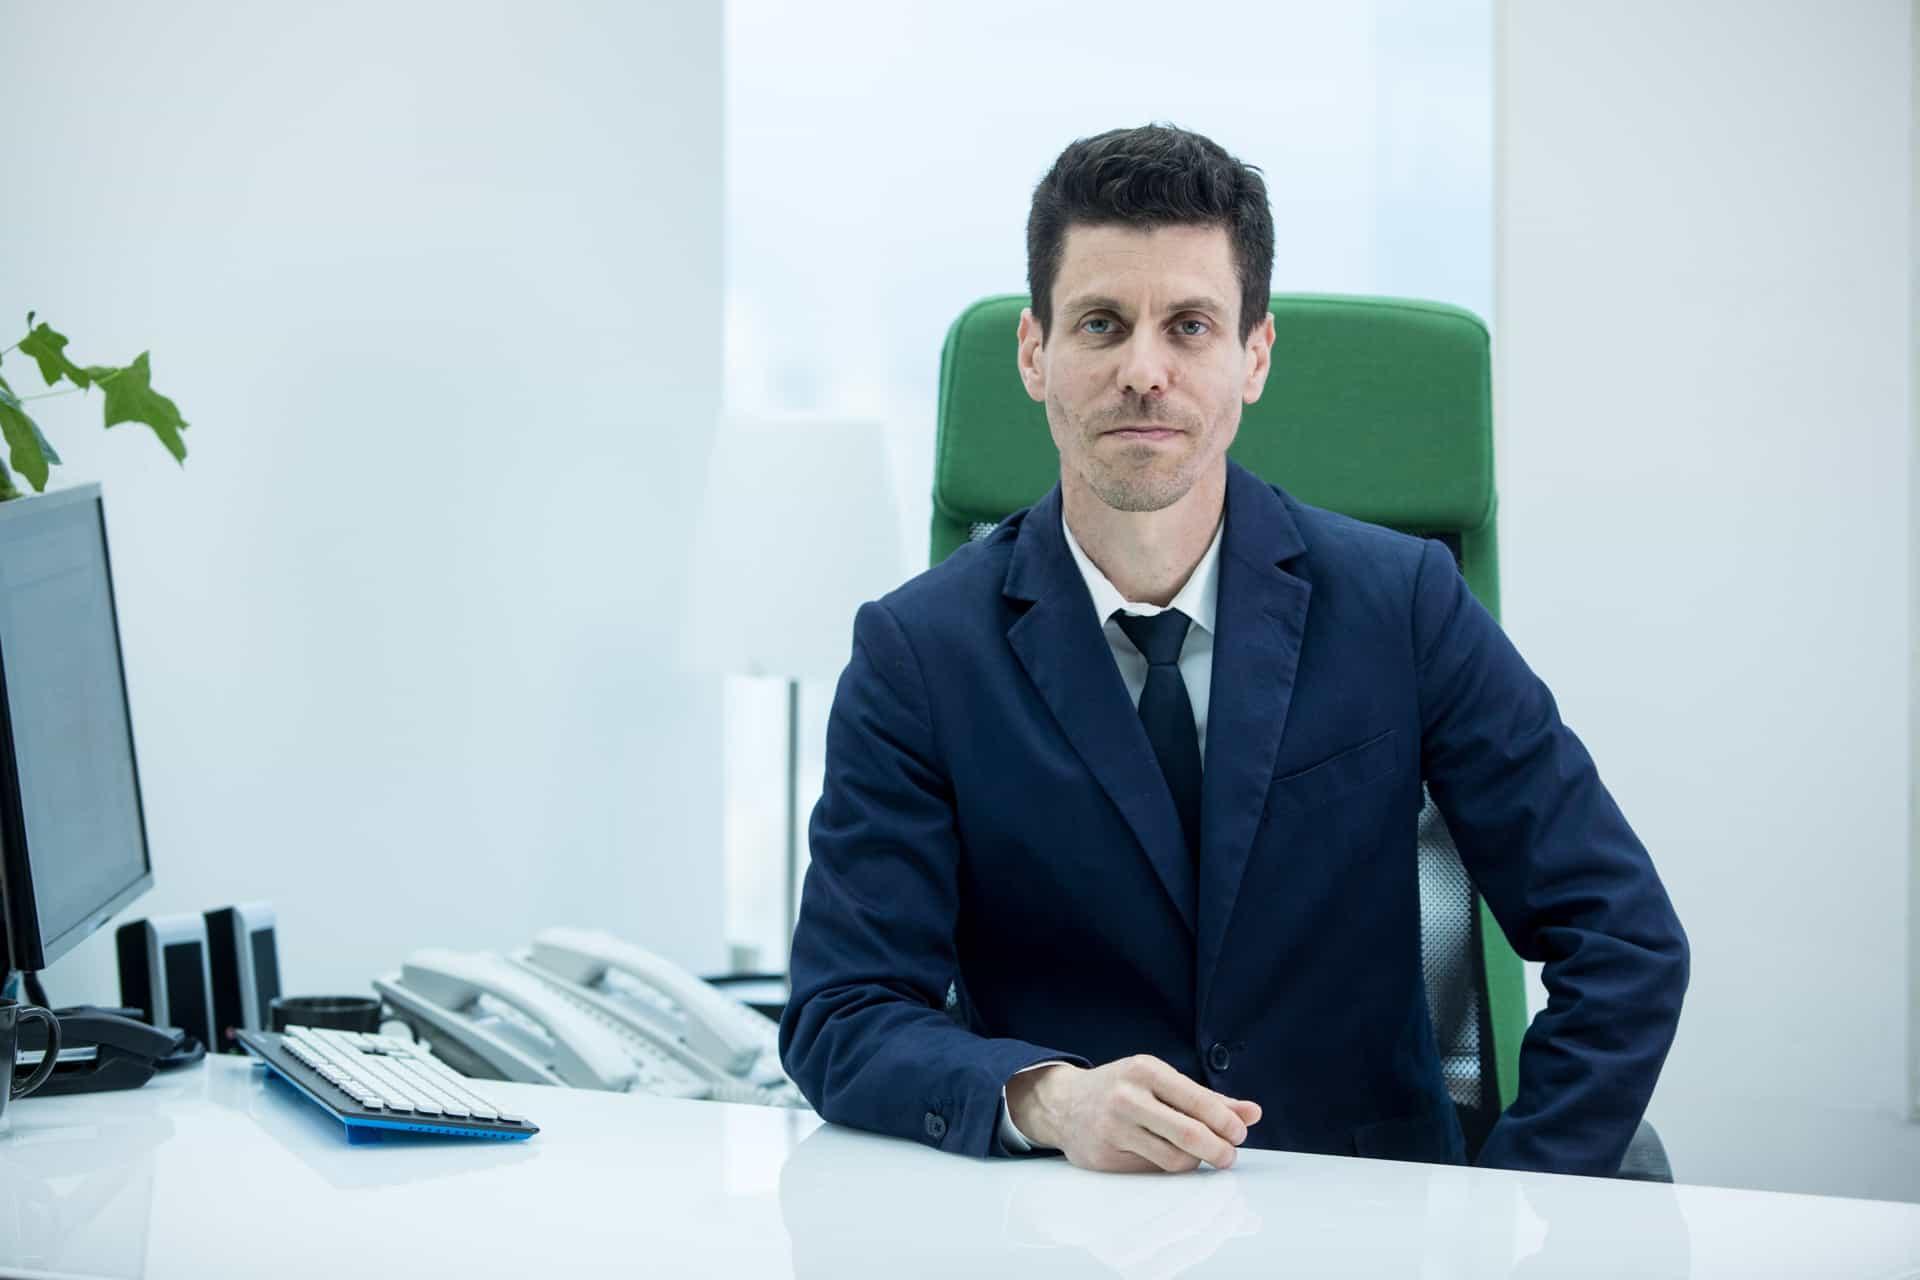 עורך דין דיני עבודה תל אביב